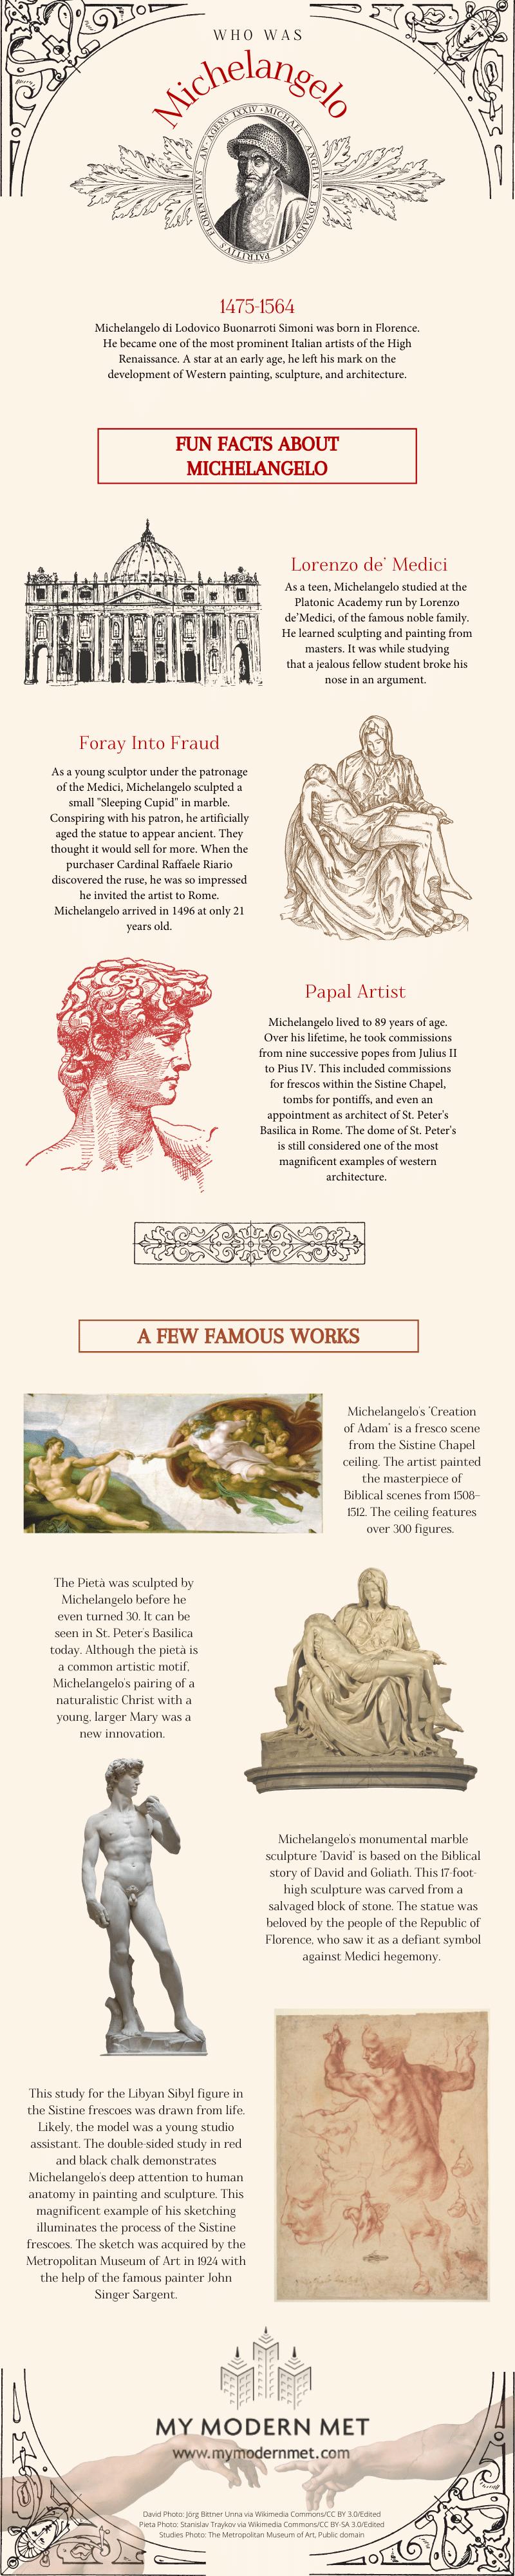 Michelangelo Infographic